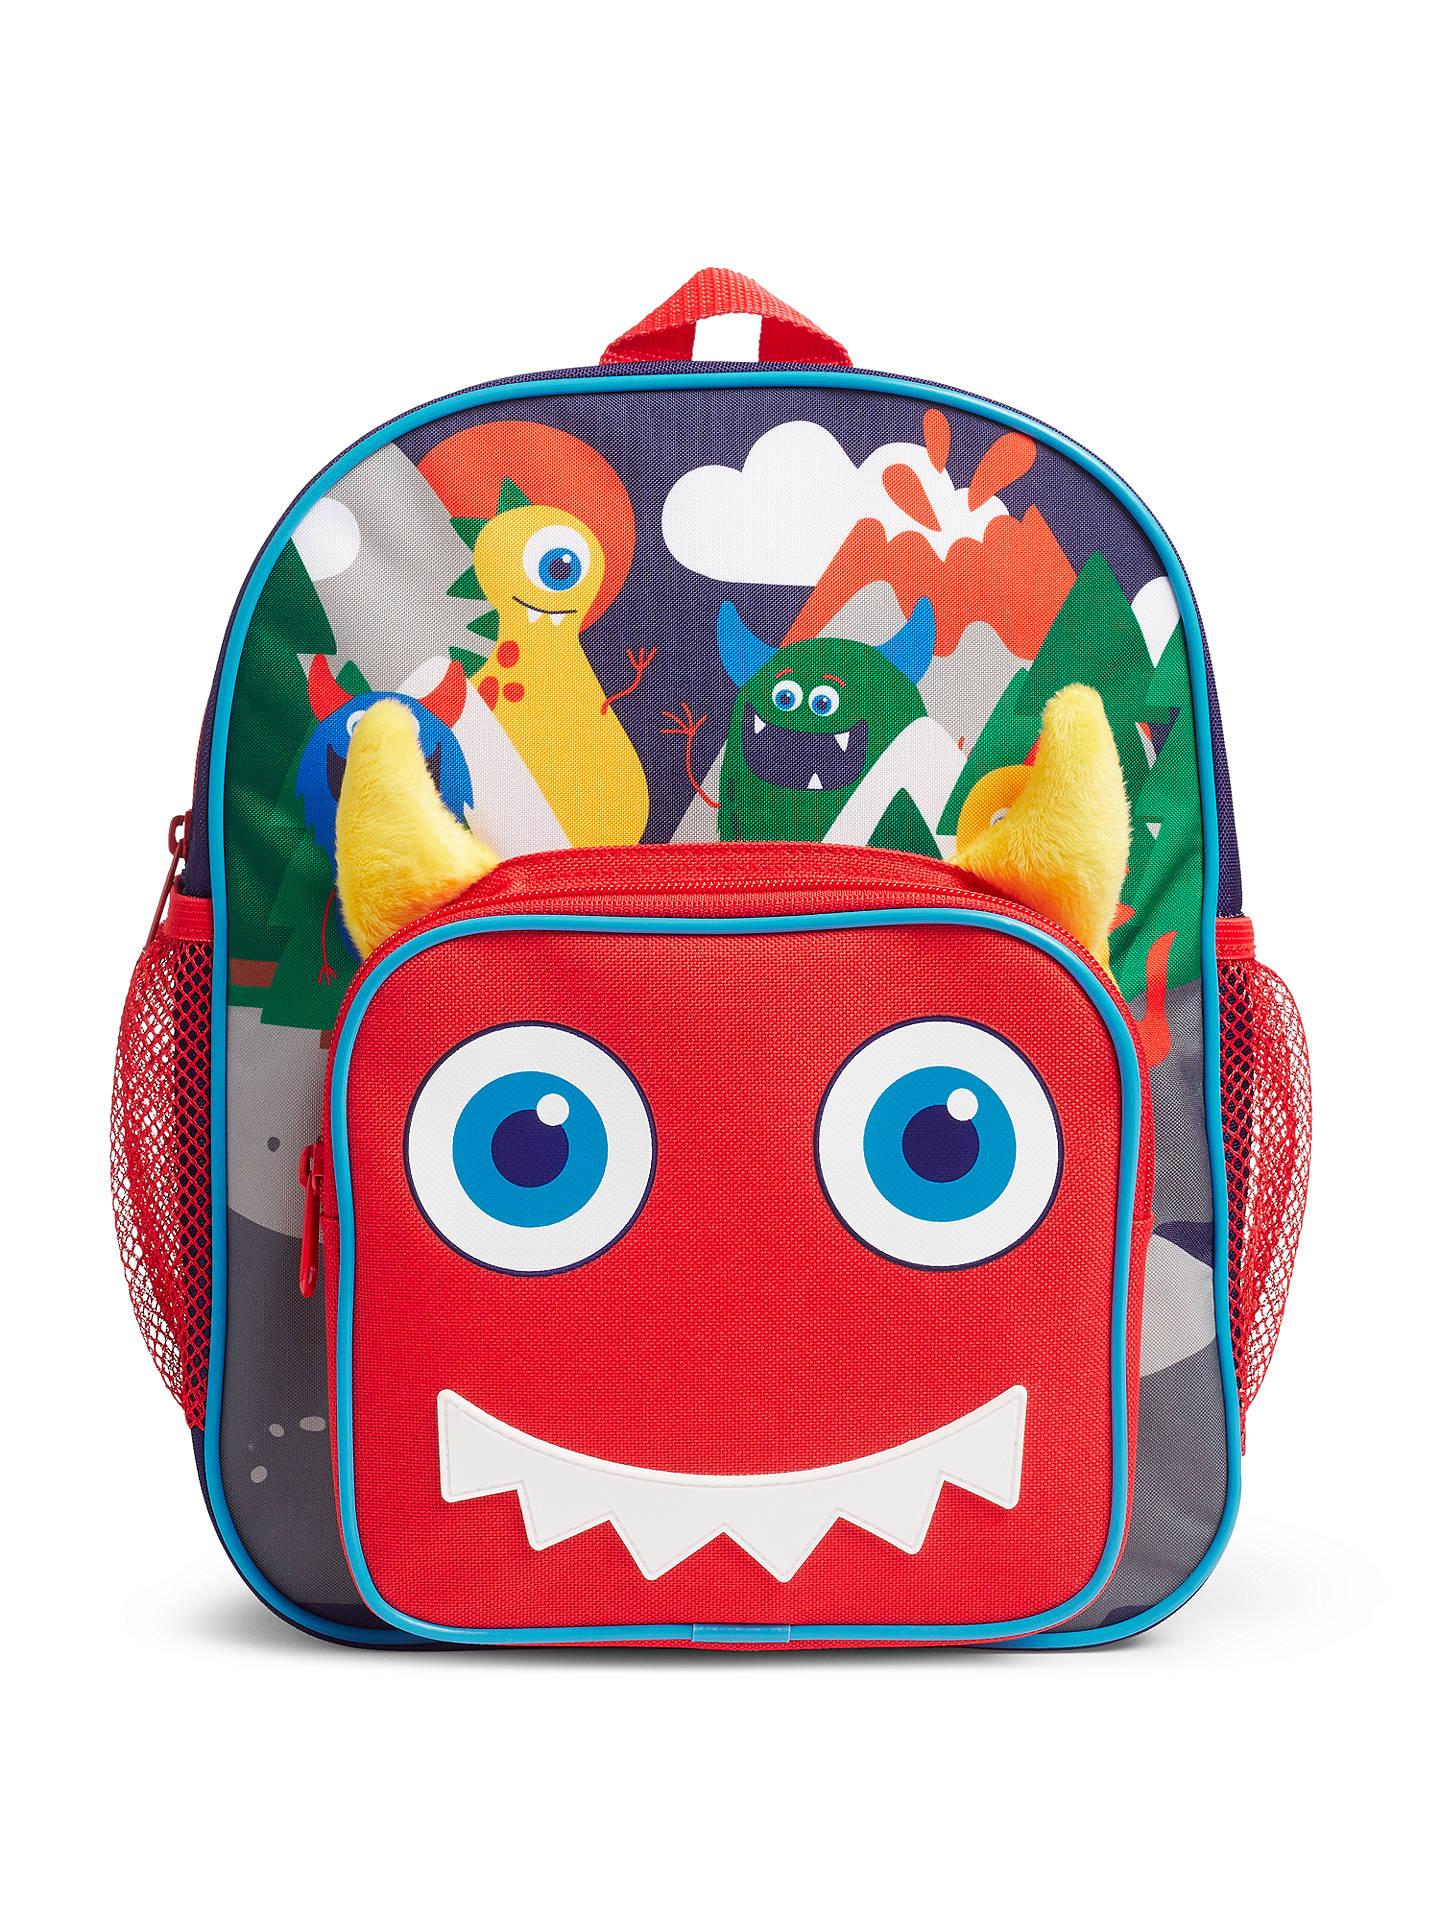 2c340be61a Buy John Lewis & Partners Monster Children's Backpack, Multi Online at  johnlewis. ...